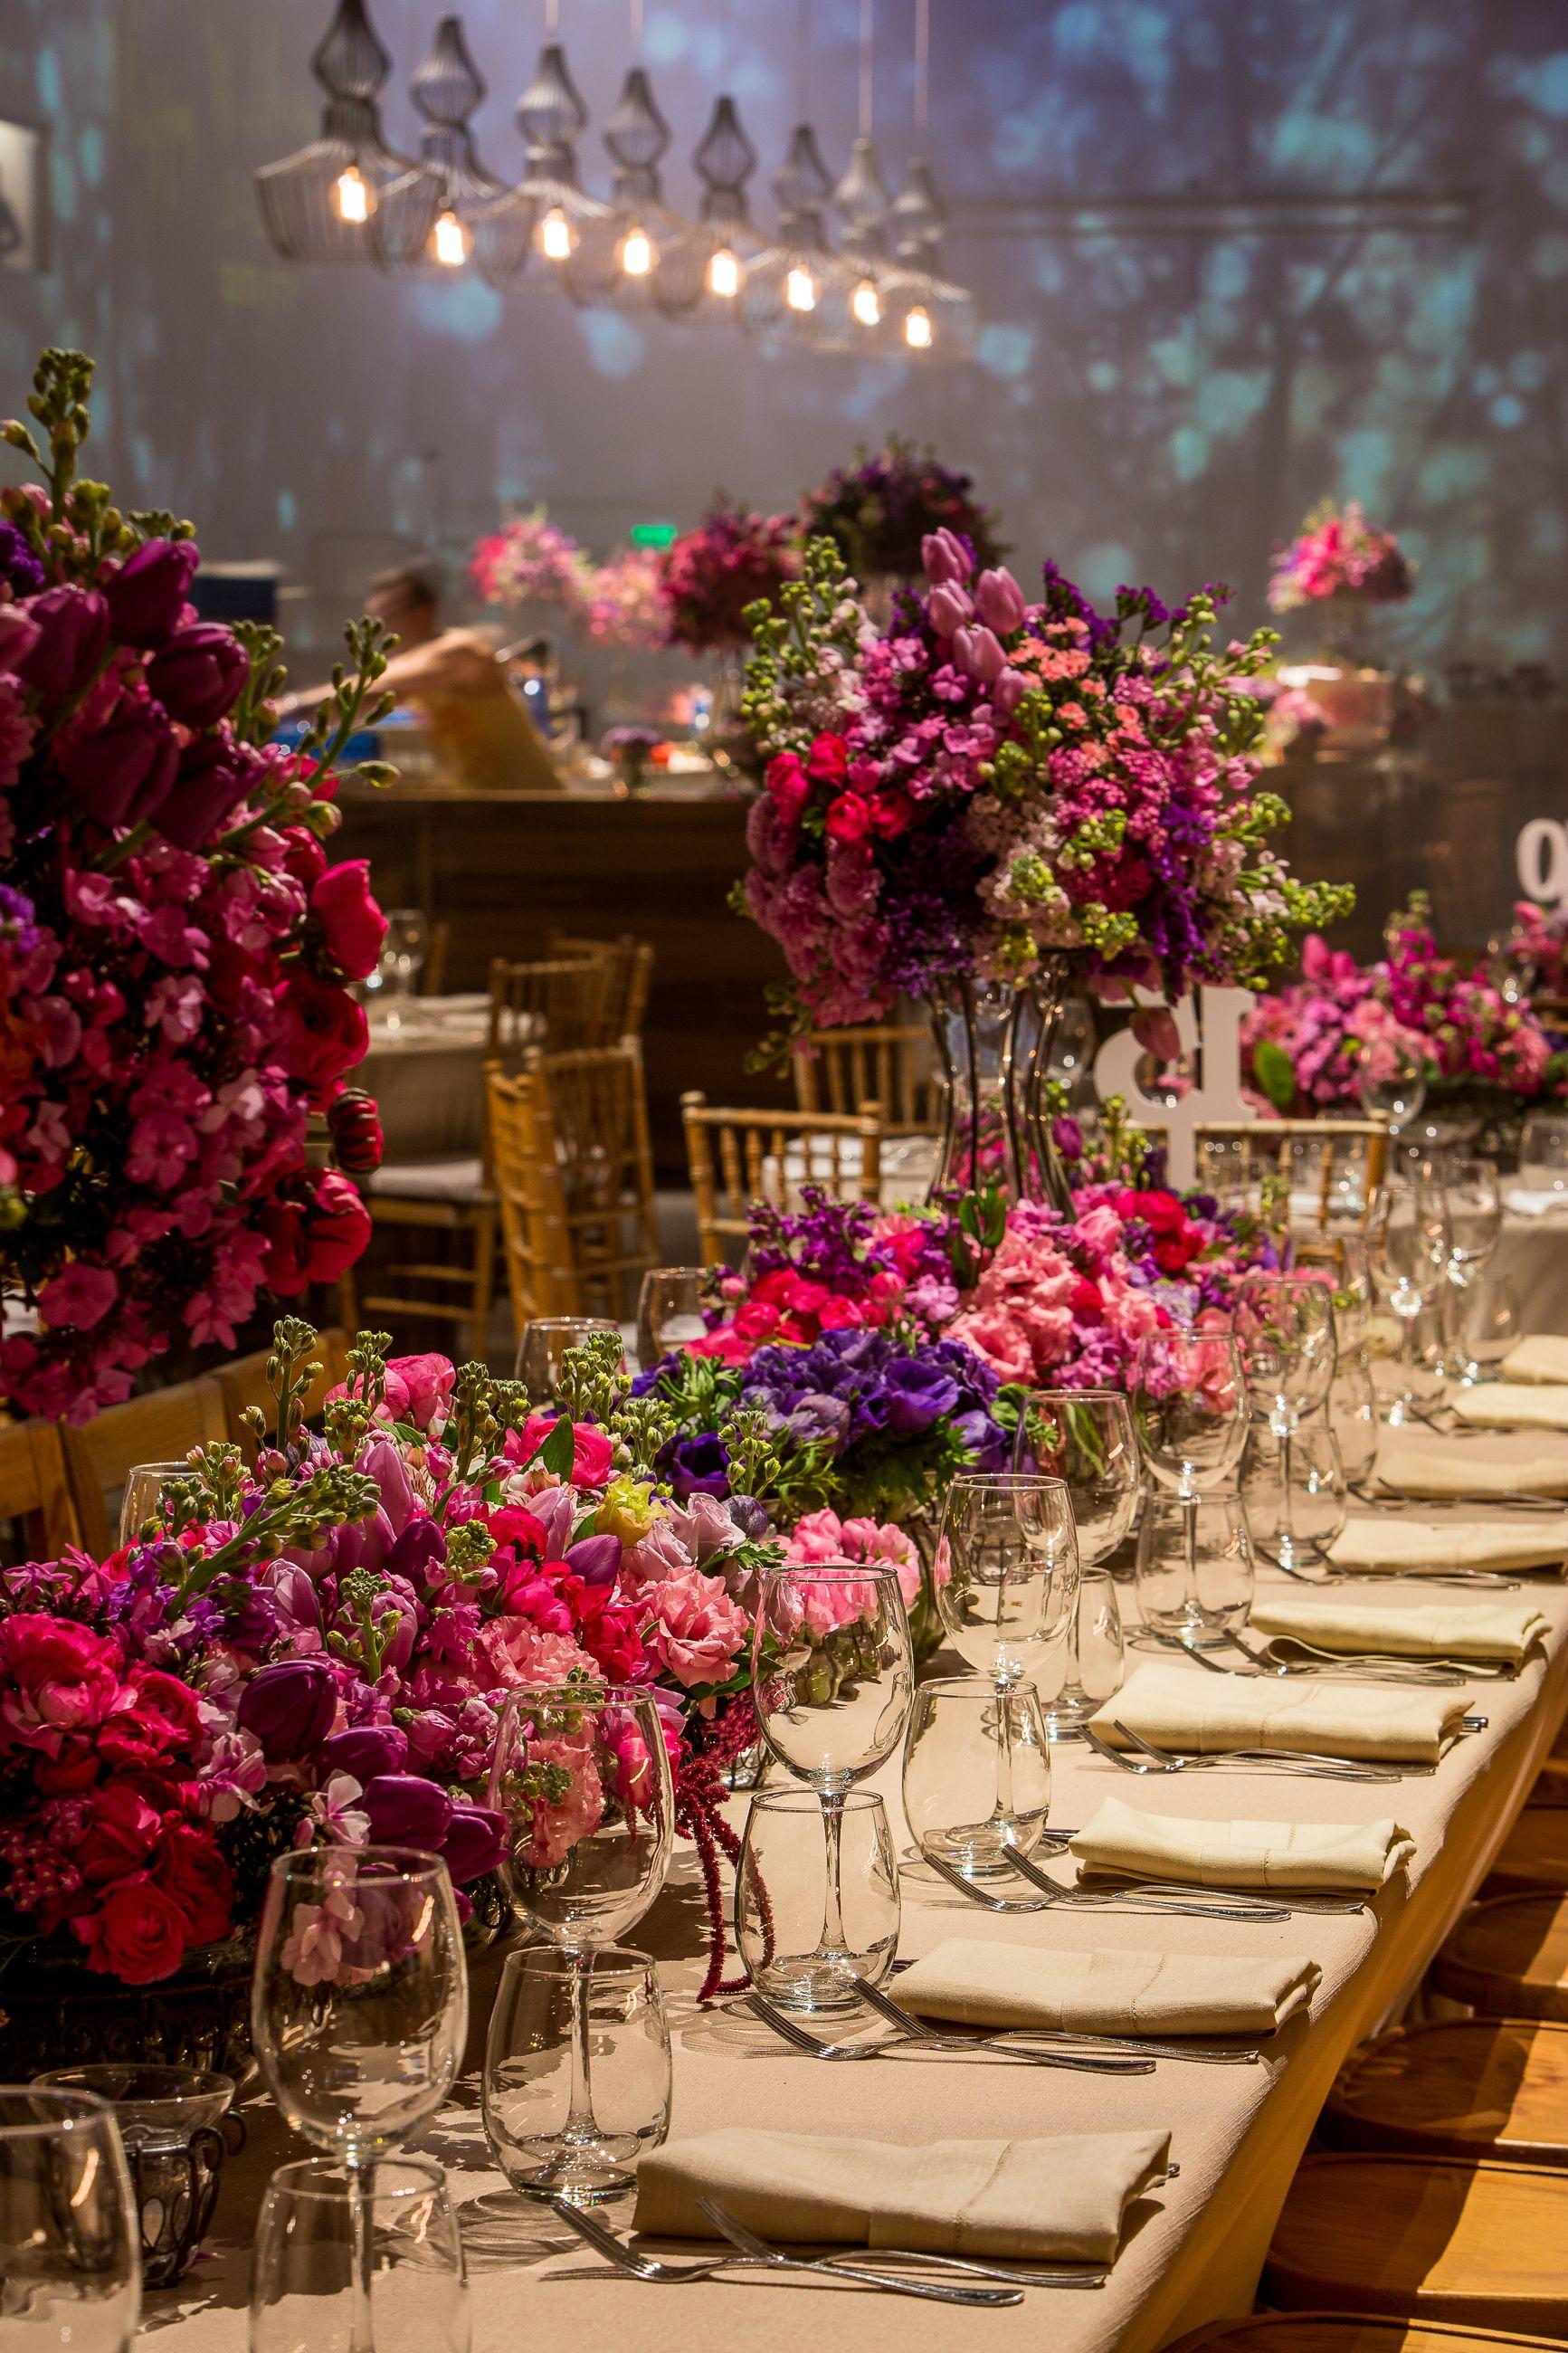 Wedding Flowers Filled Tel Aviv S Hangar 11 Last Night For A Christmas Eve Spectacular Extravaganza